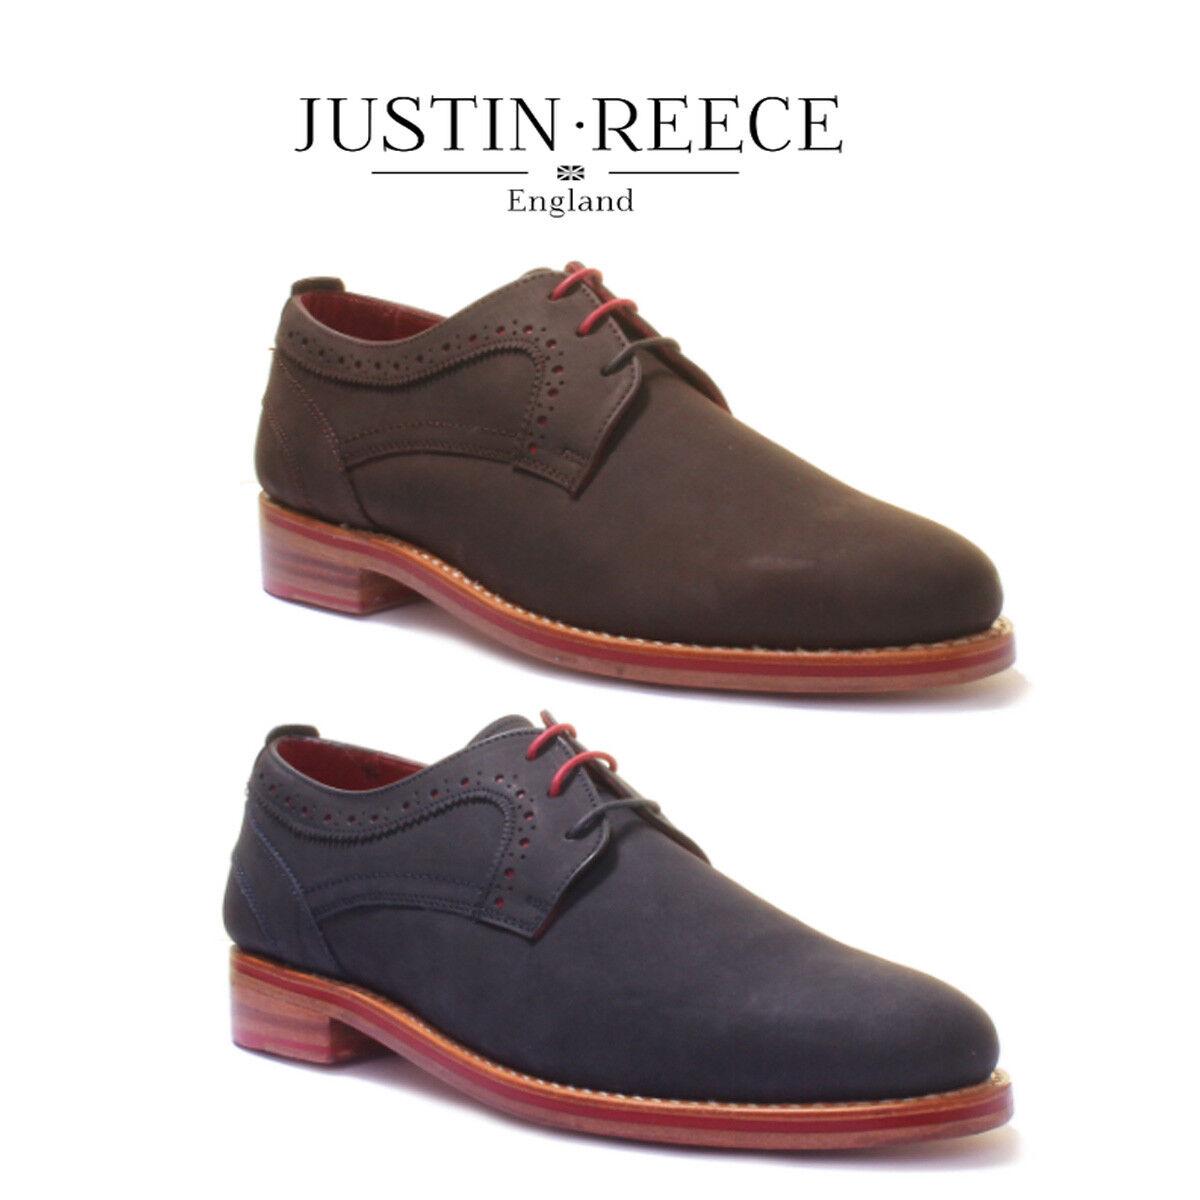 Justin Reece Owen Mens Nubuck Lace up Oxford Leatrher Size Uk 6 - 12